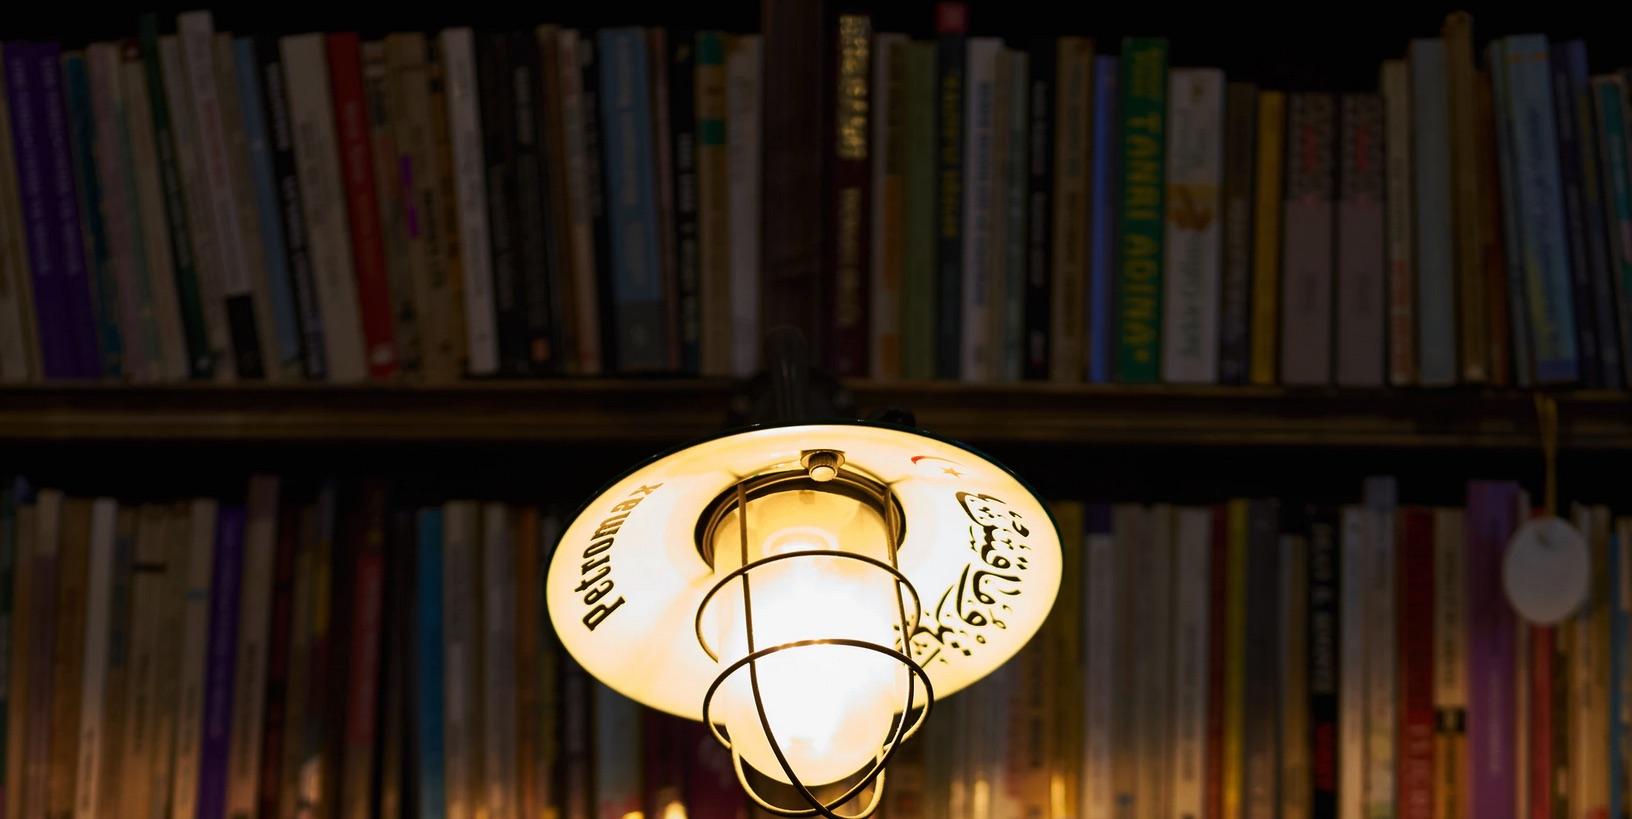 Shining a light on health. Photo by  engin akyurt via unsplash